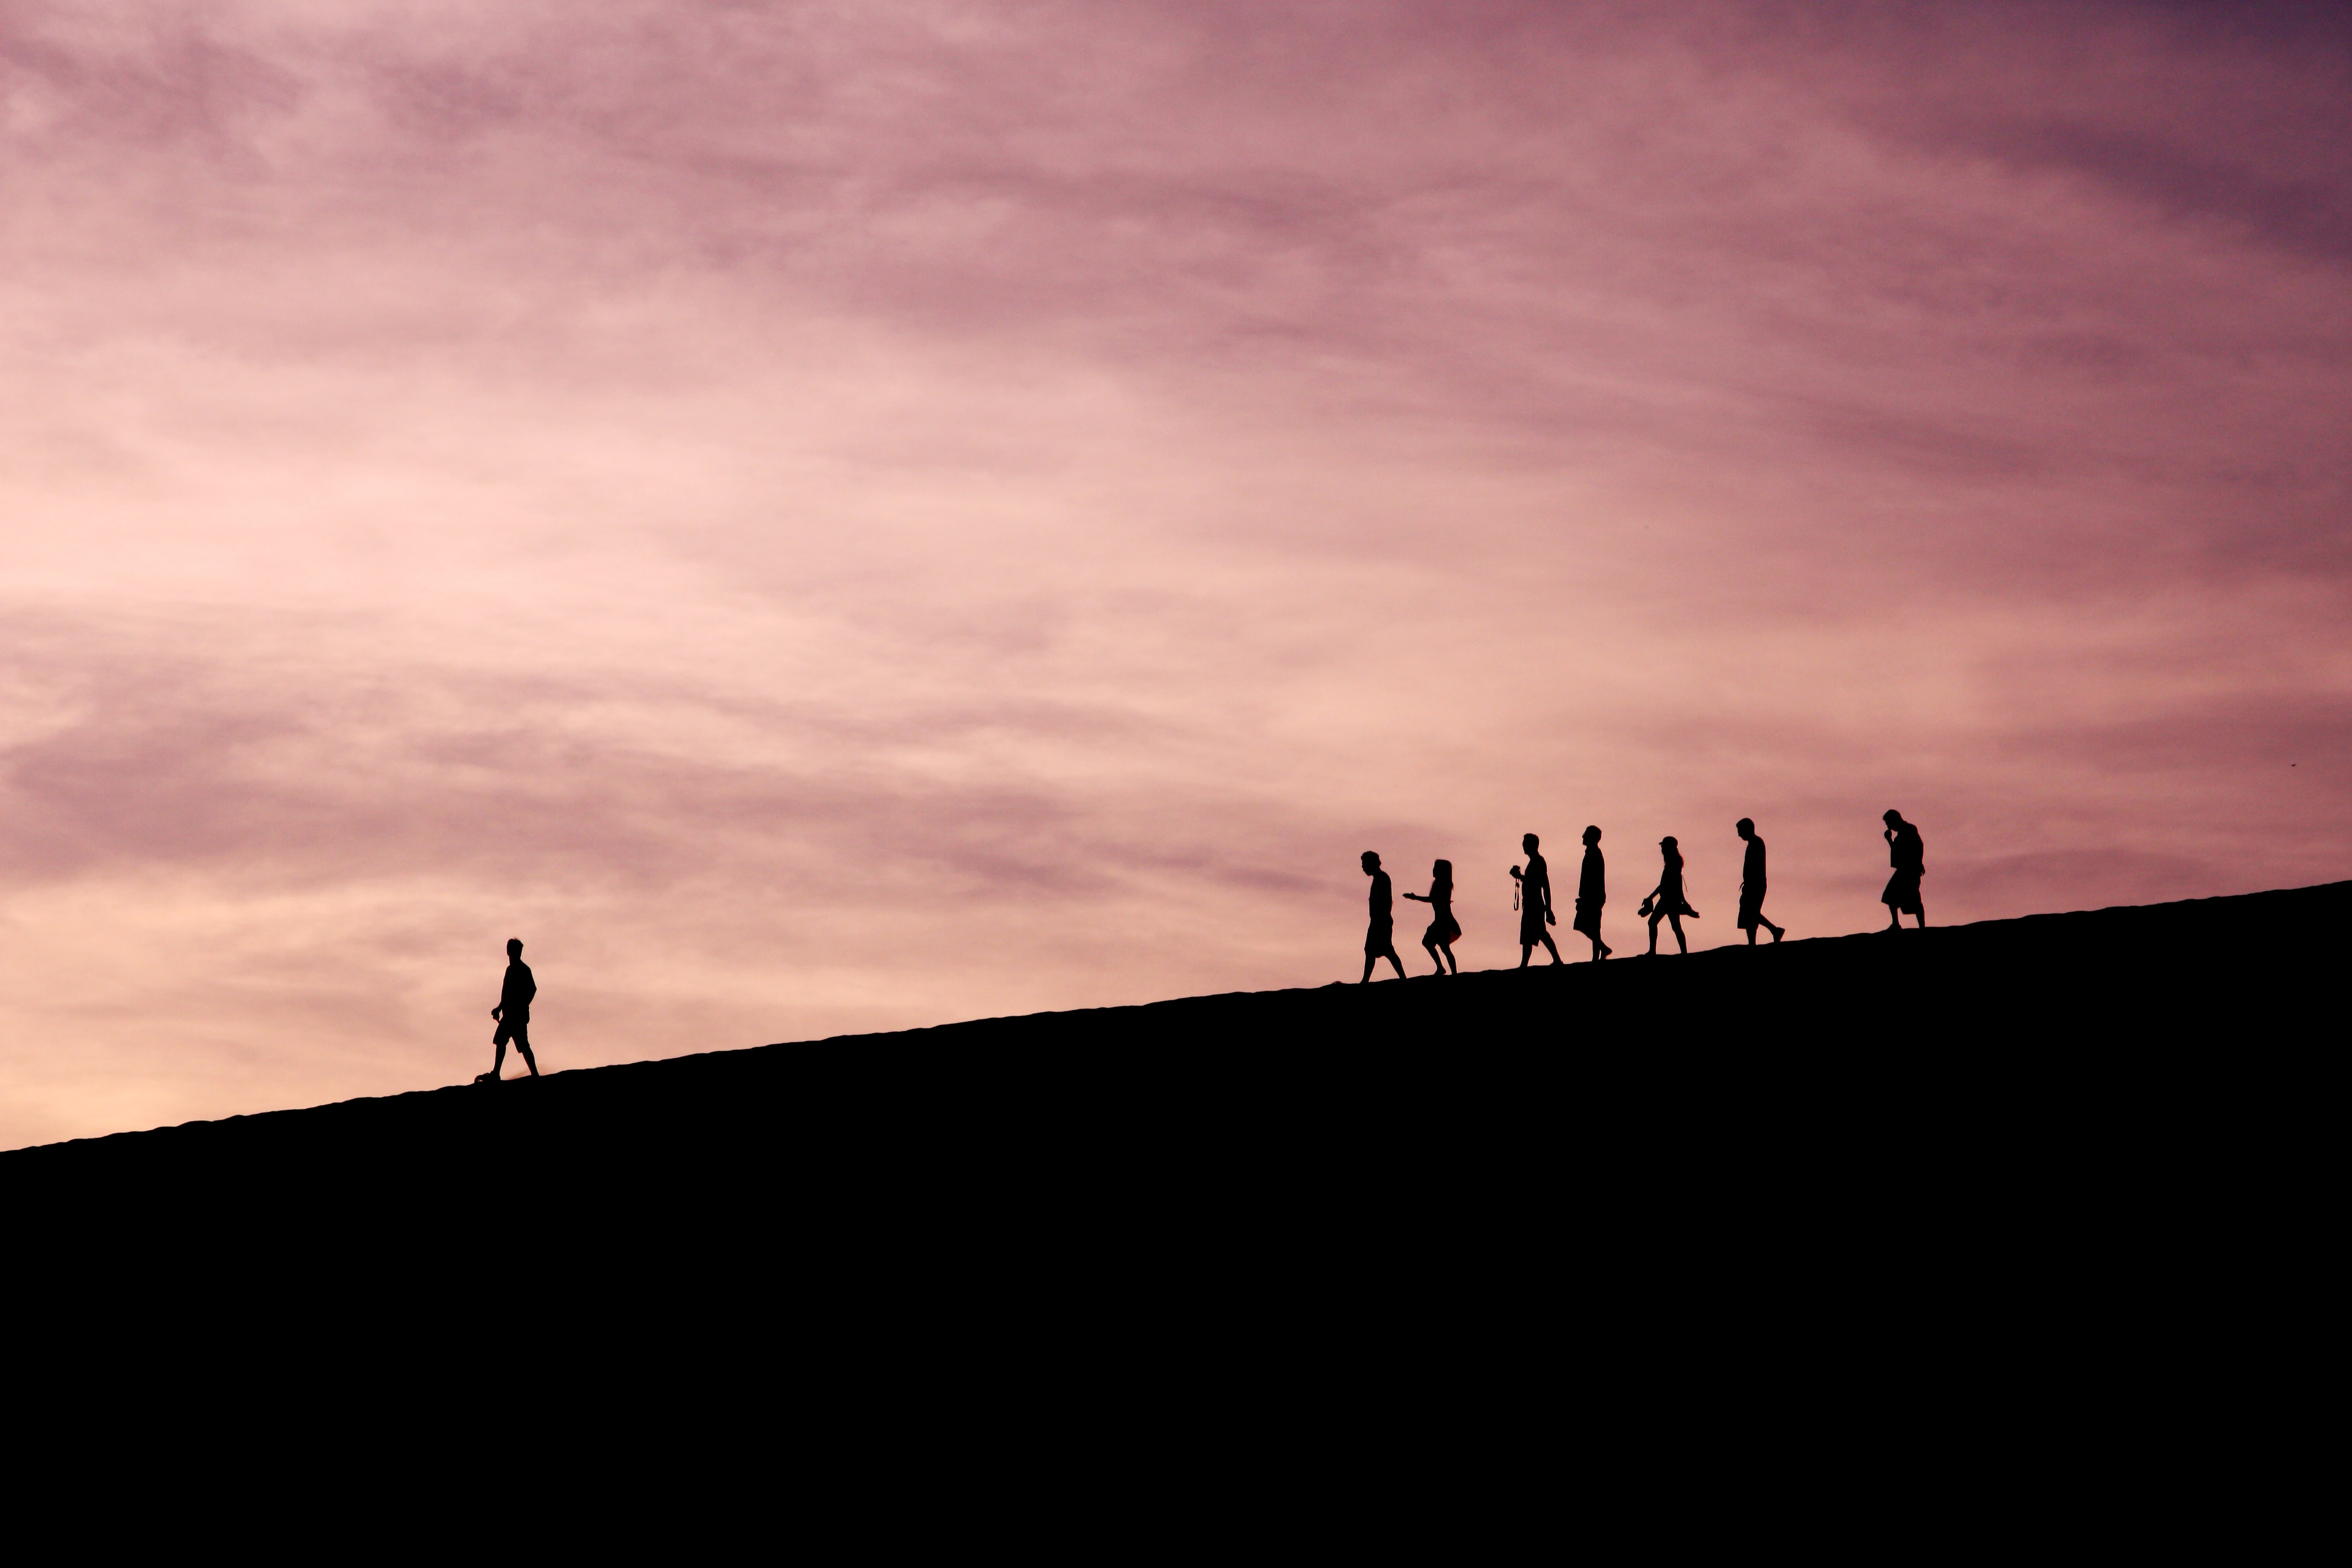 Leadership Development Remains Important for sharing the Gospel